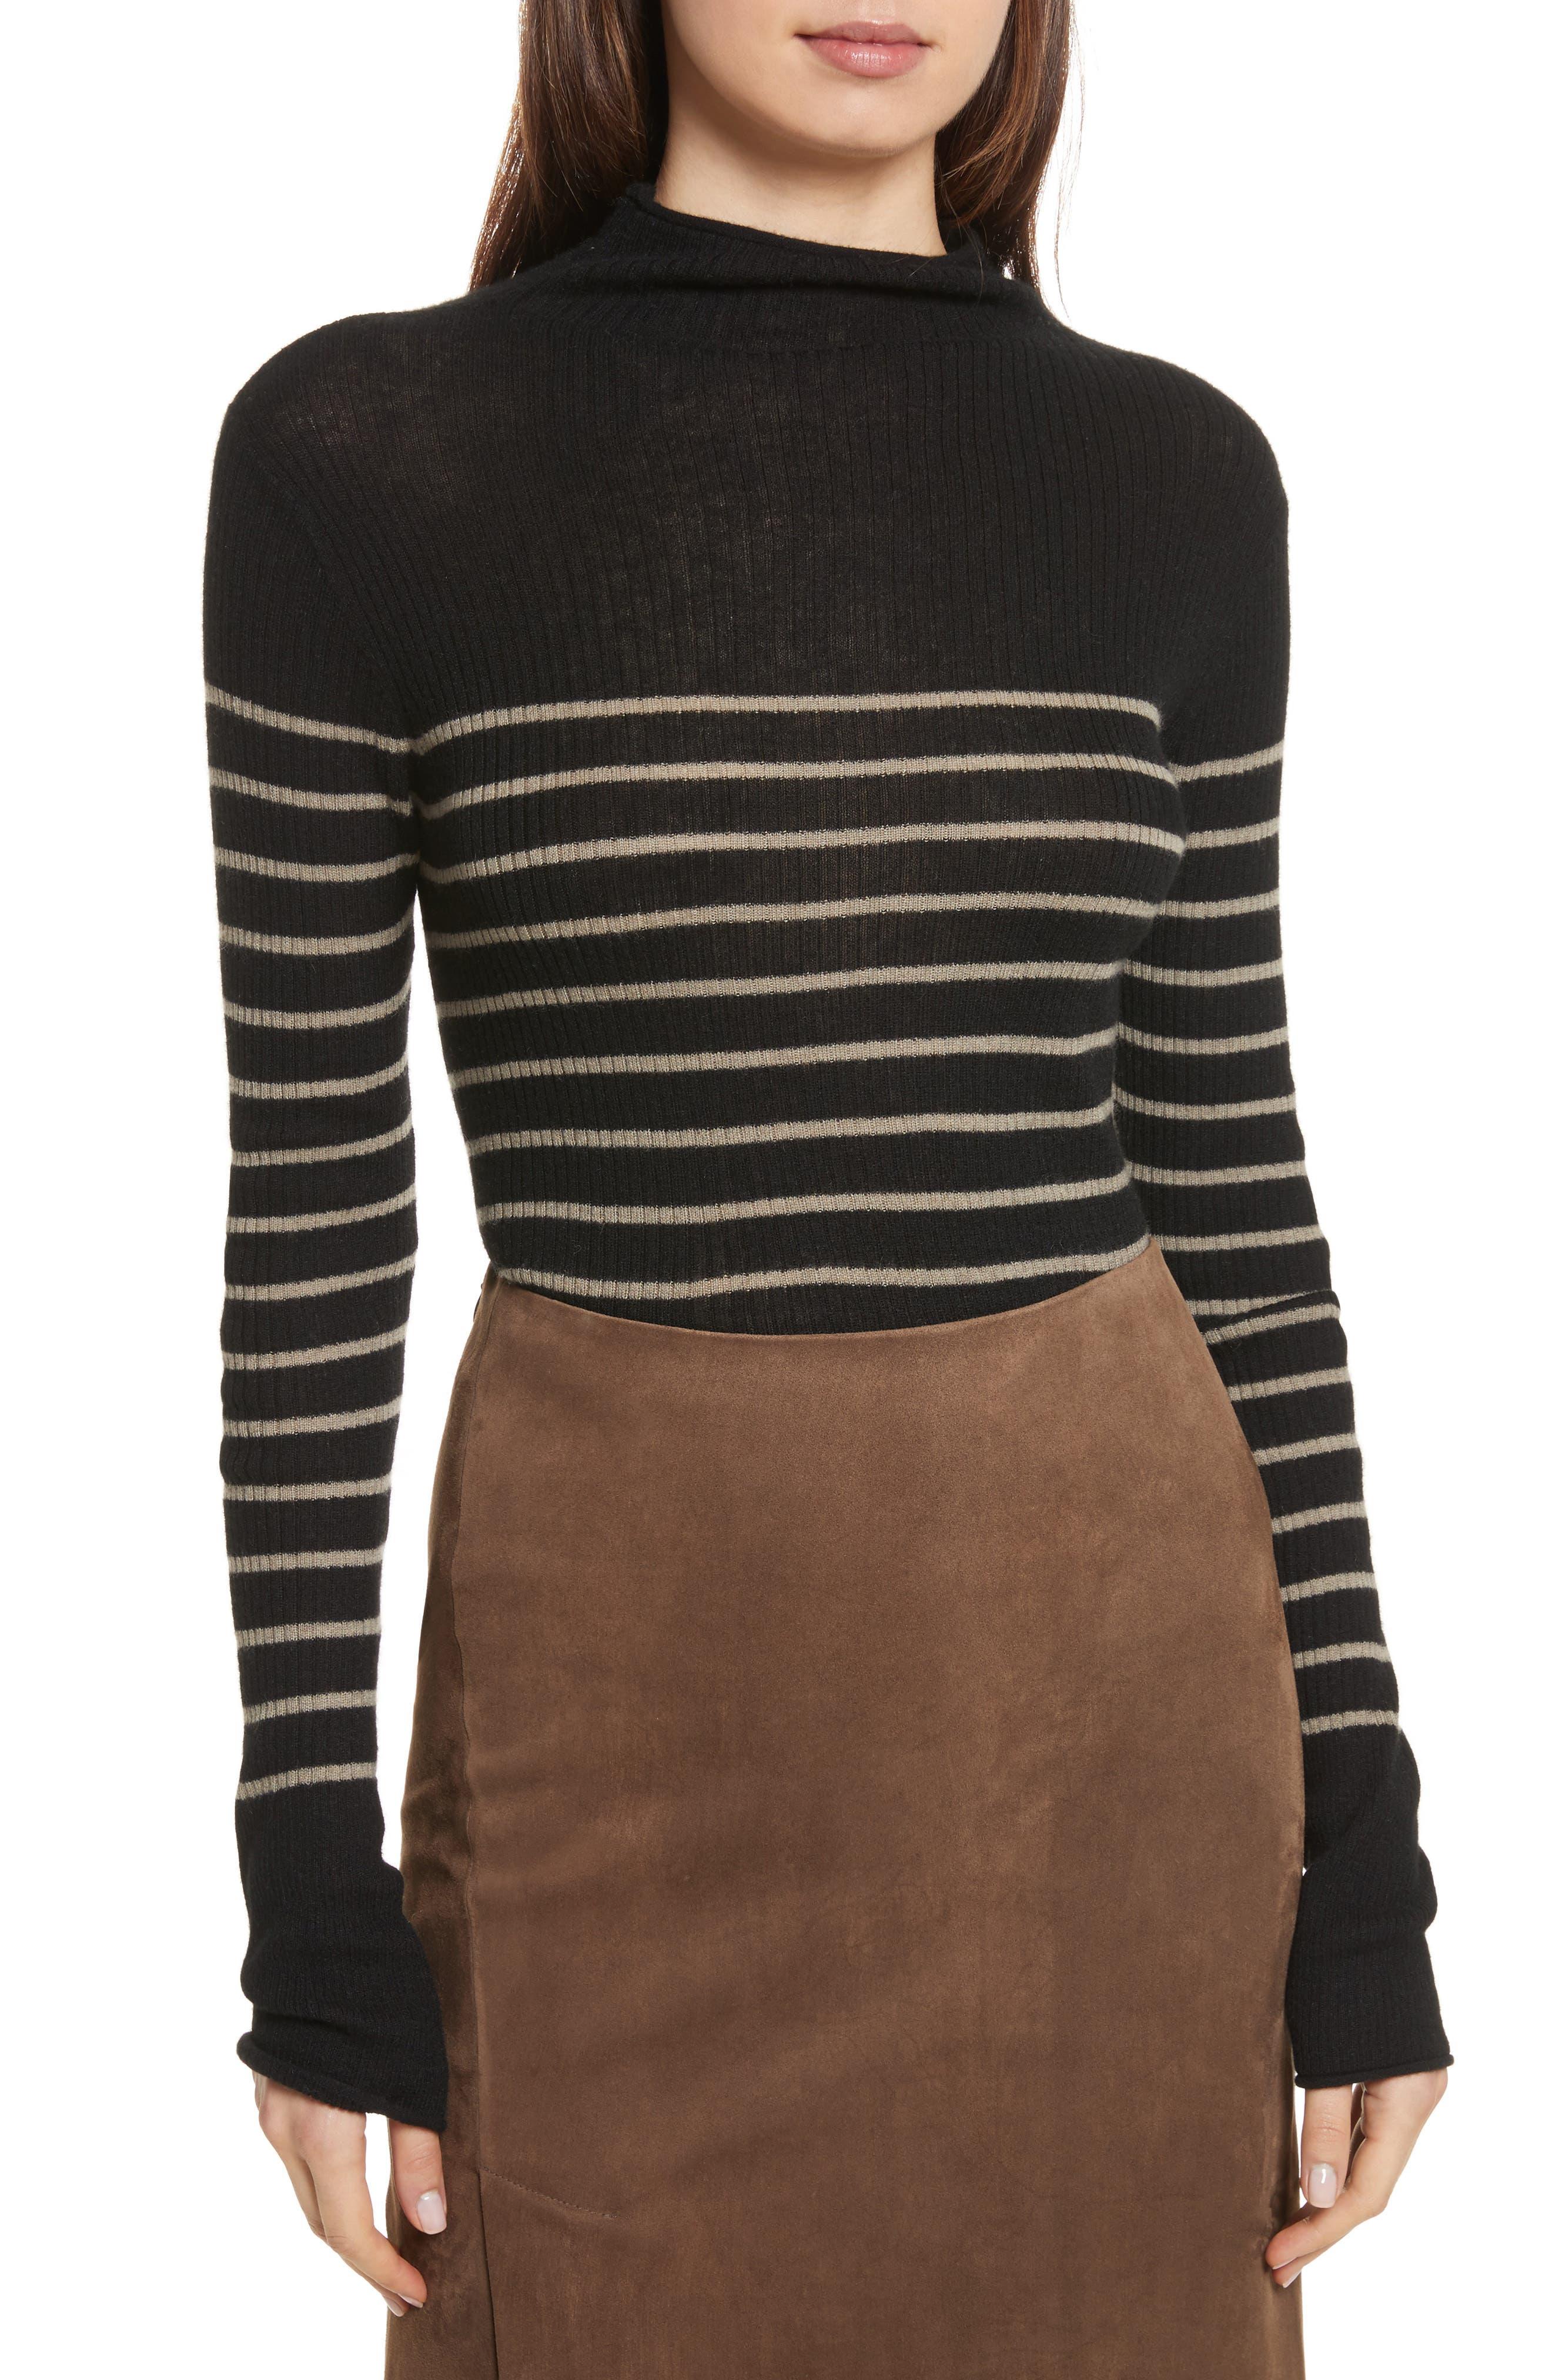 Stripe Ribbed Cashmere Sweater,                             Main thumbnail 1, color,                             Black/ Pebble Taupe